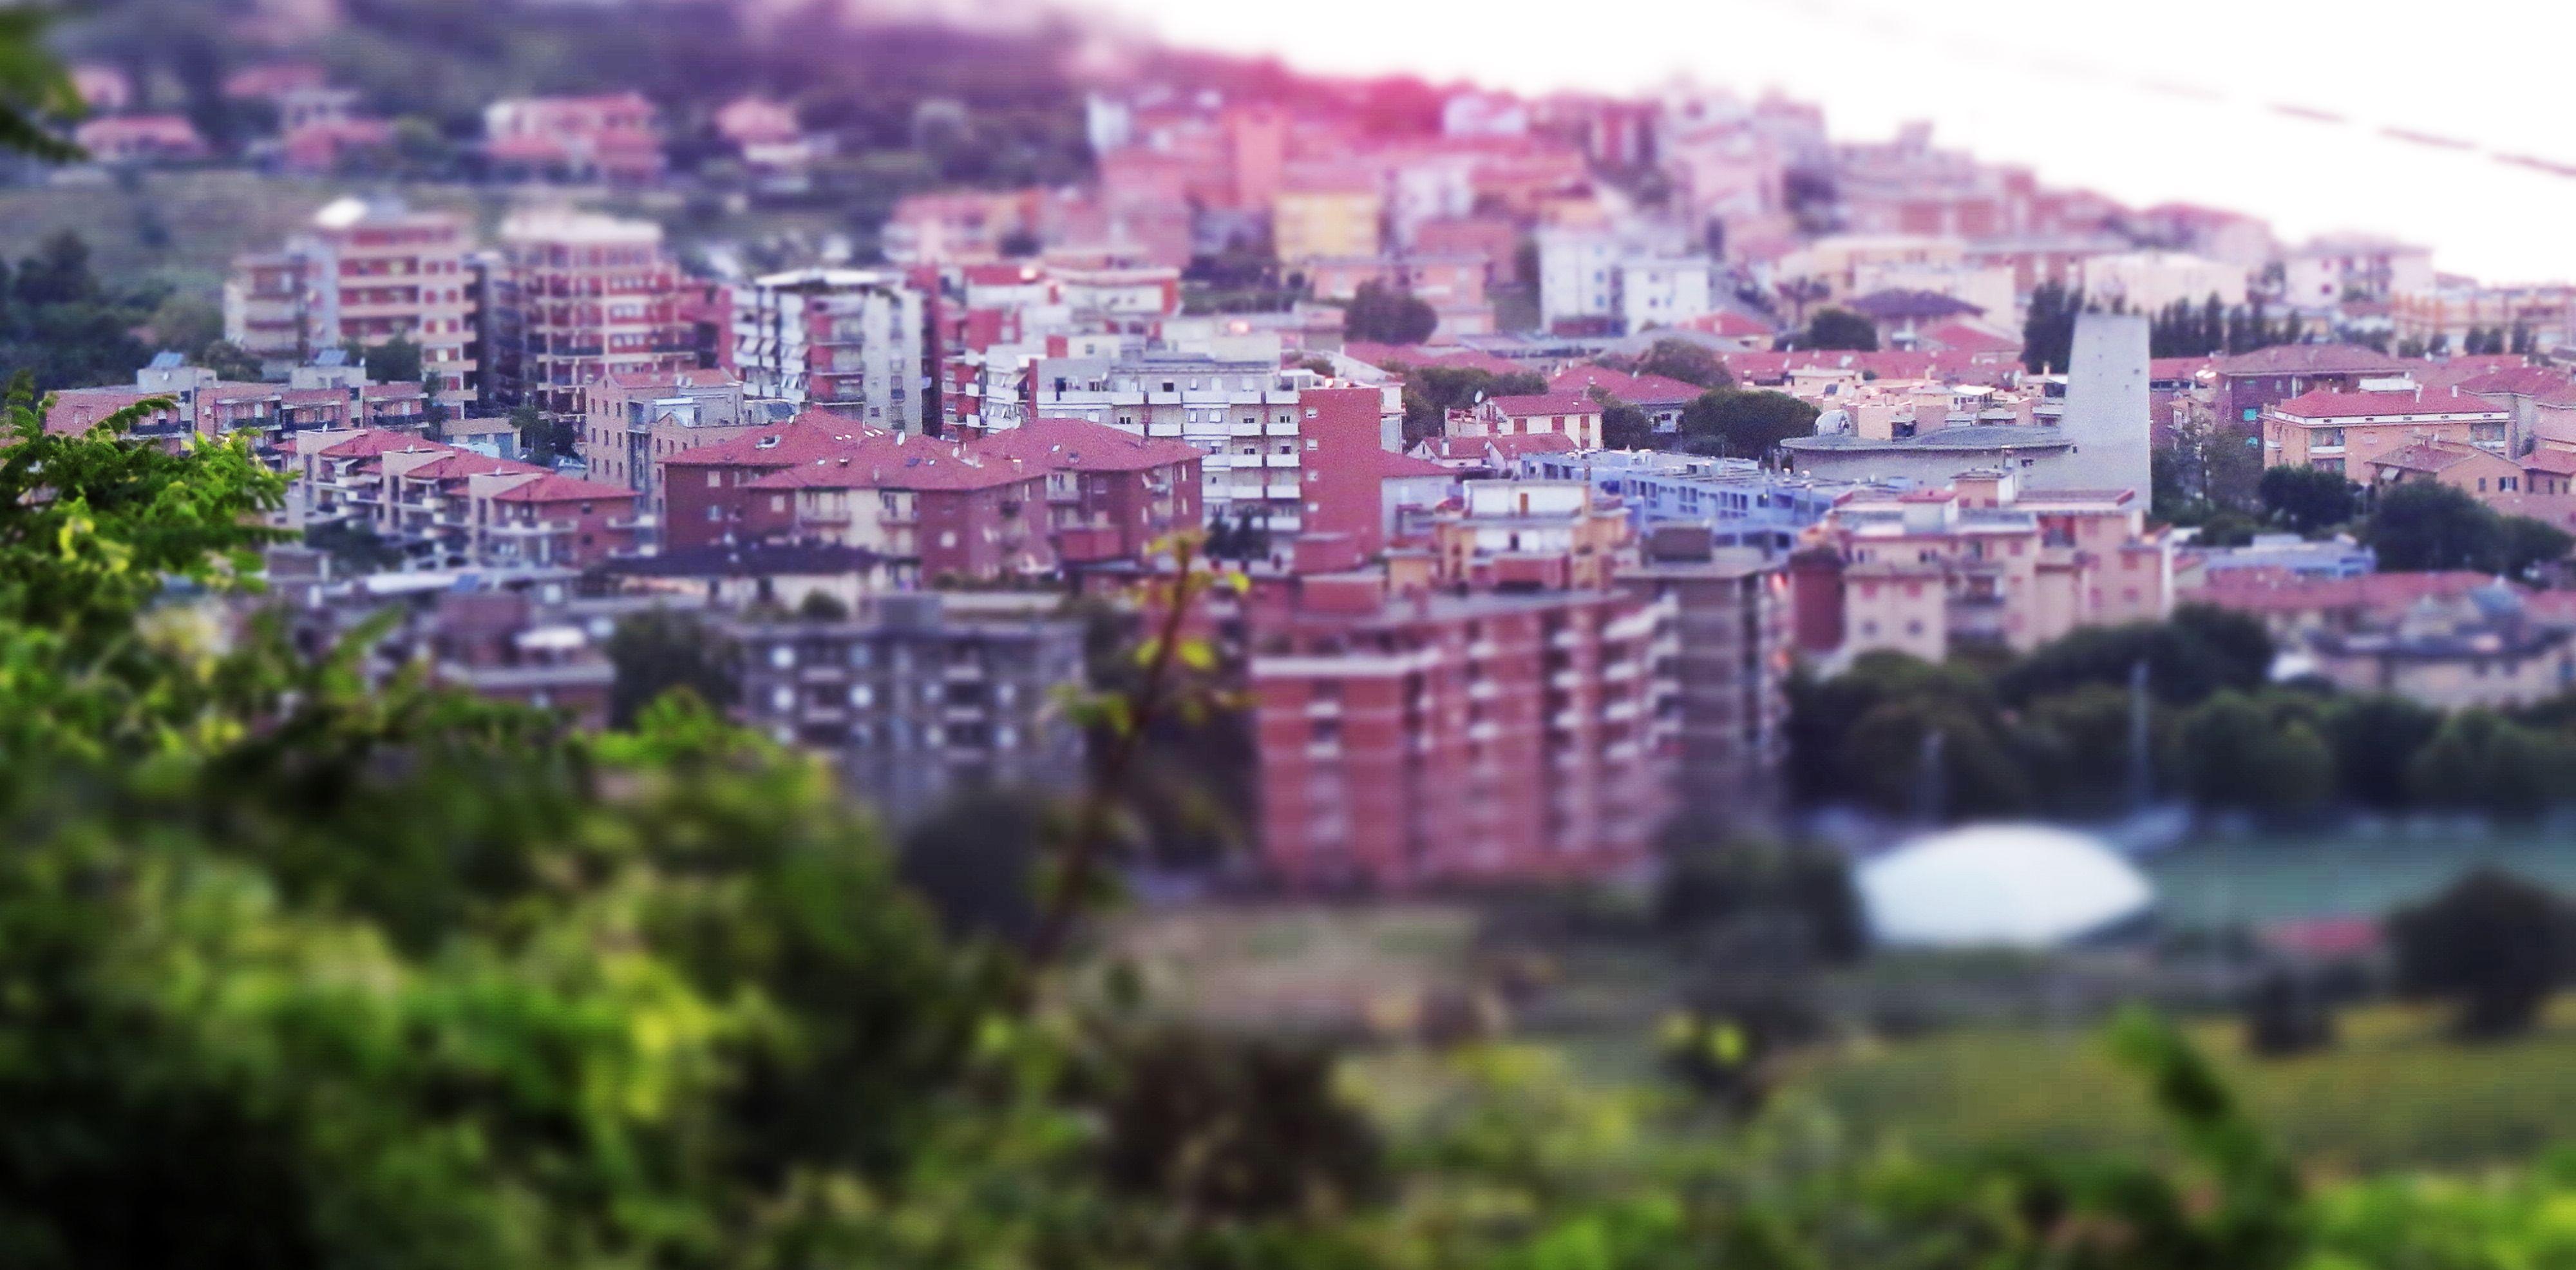 Ancona, Marche, Italy - suburb,Torrette di Ancona - Photo by Gianni Del Bufalo bygdb   Attribution-ShareAlike 2.0 Generic (CC BY-SA 2.0)